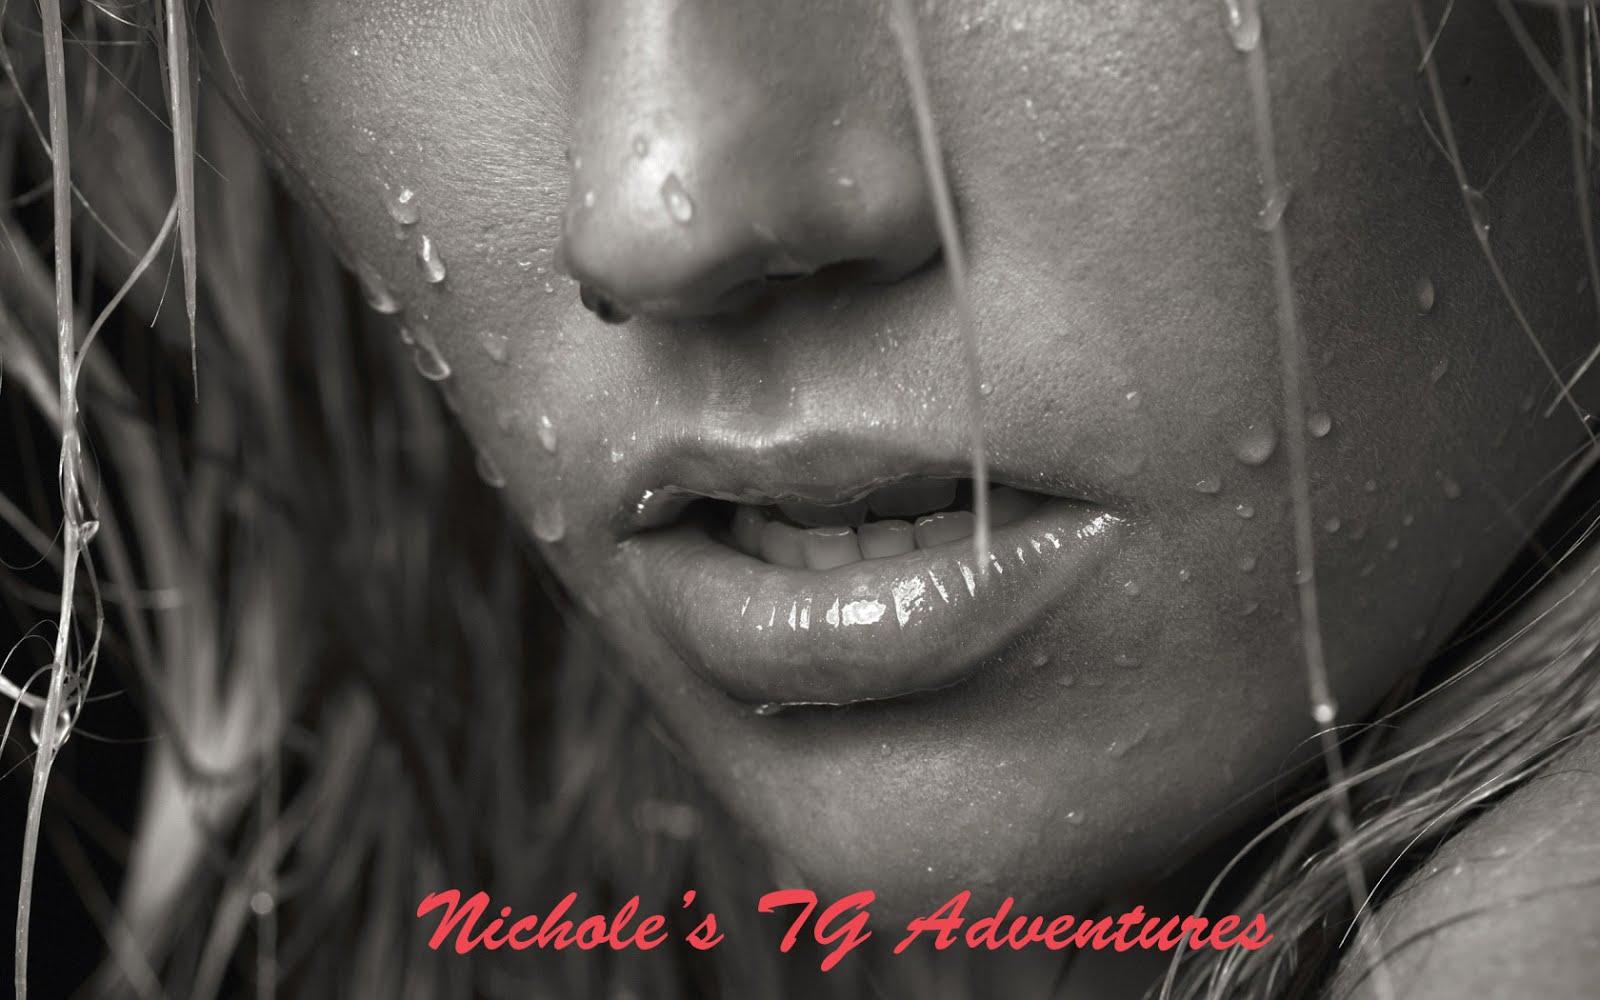 Nichole's TG Adventures